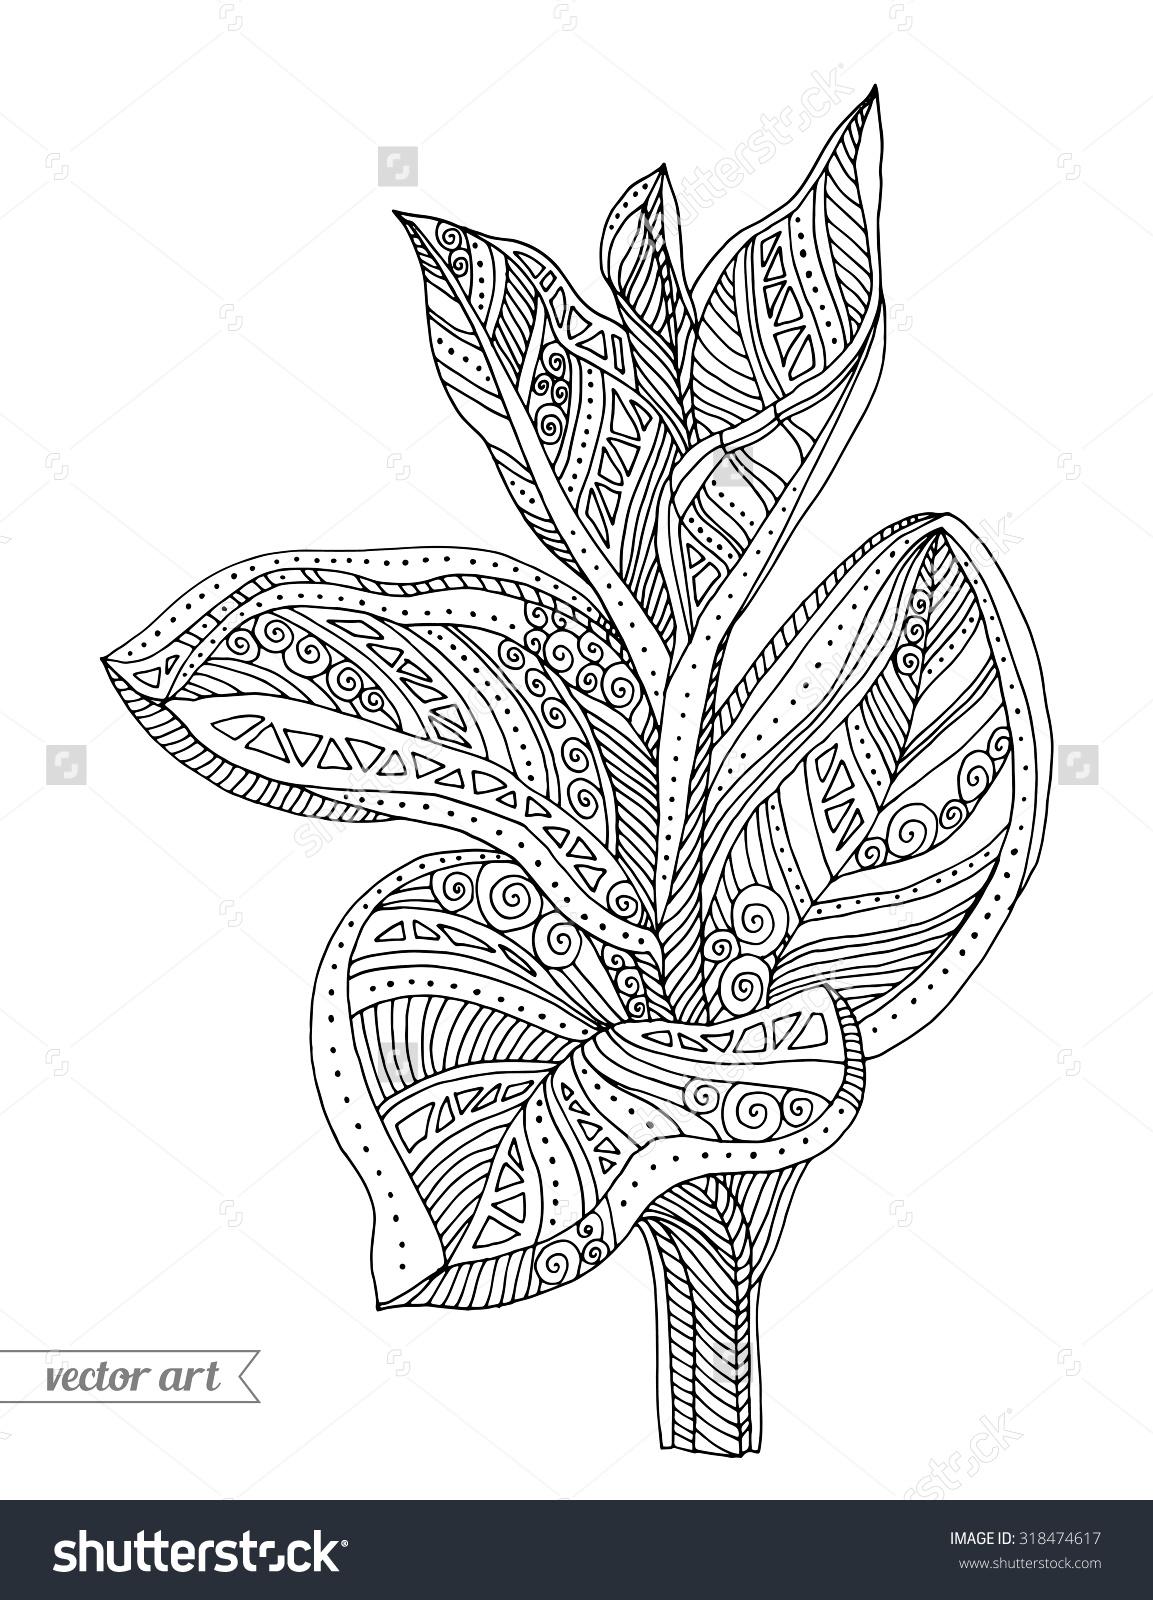 Drawn bush scenery Leaves bush vector branch forest